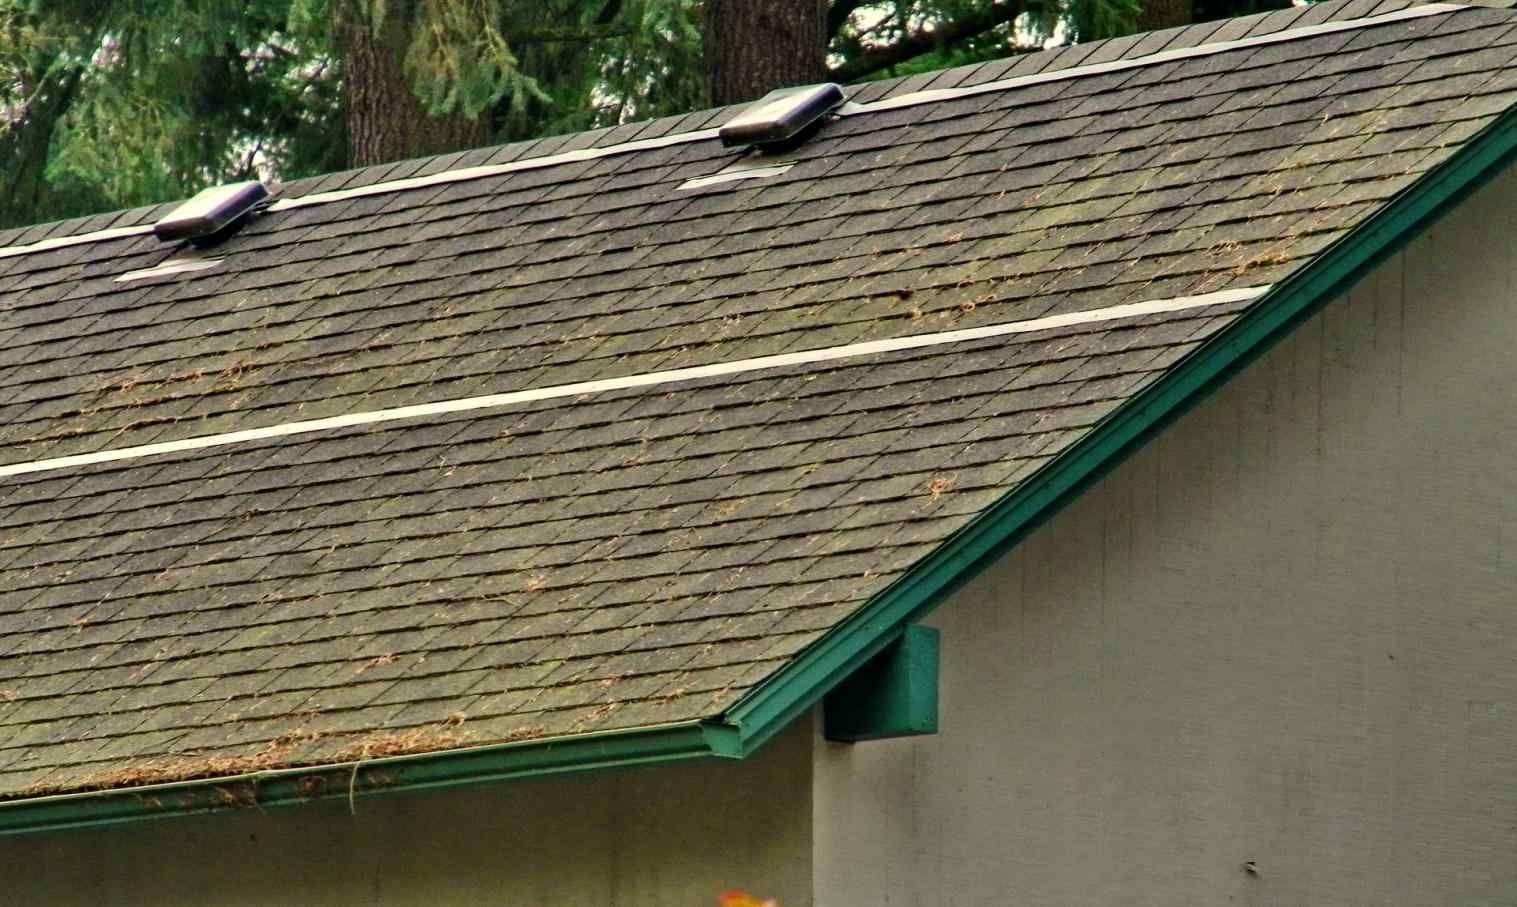 Moss Removal From Roof Shingles Cedar Shingle Roof Roof Shingles Shingling